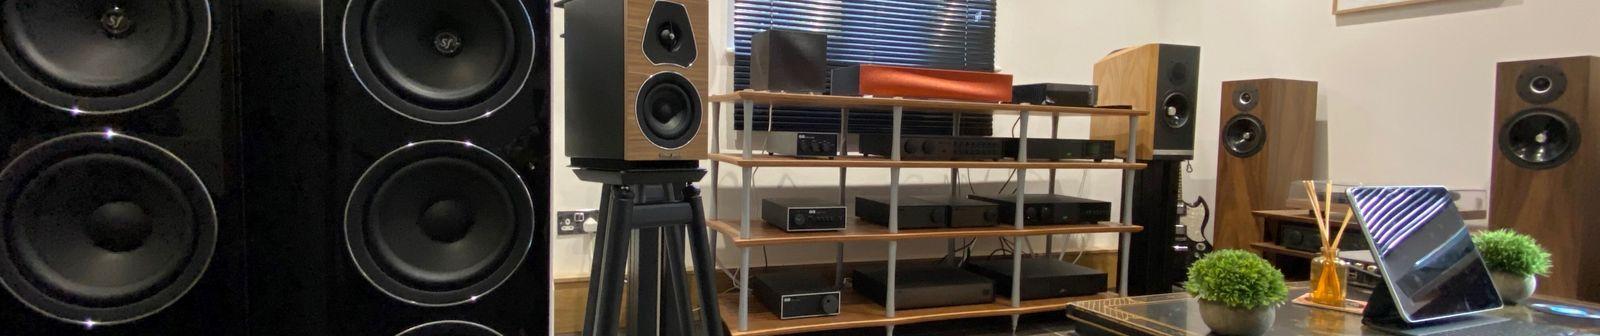 Cultured Audio Updated 2